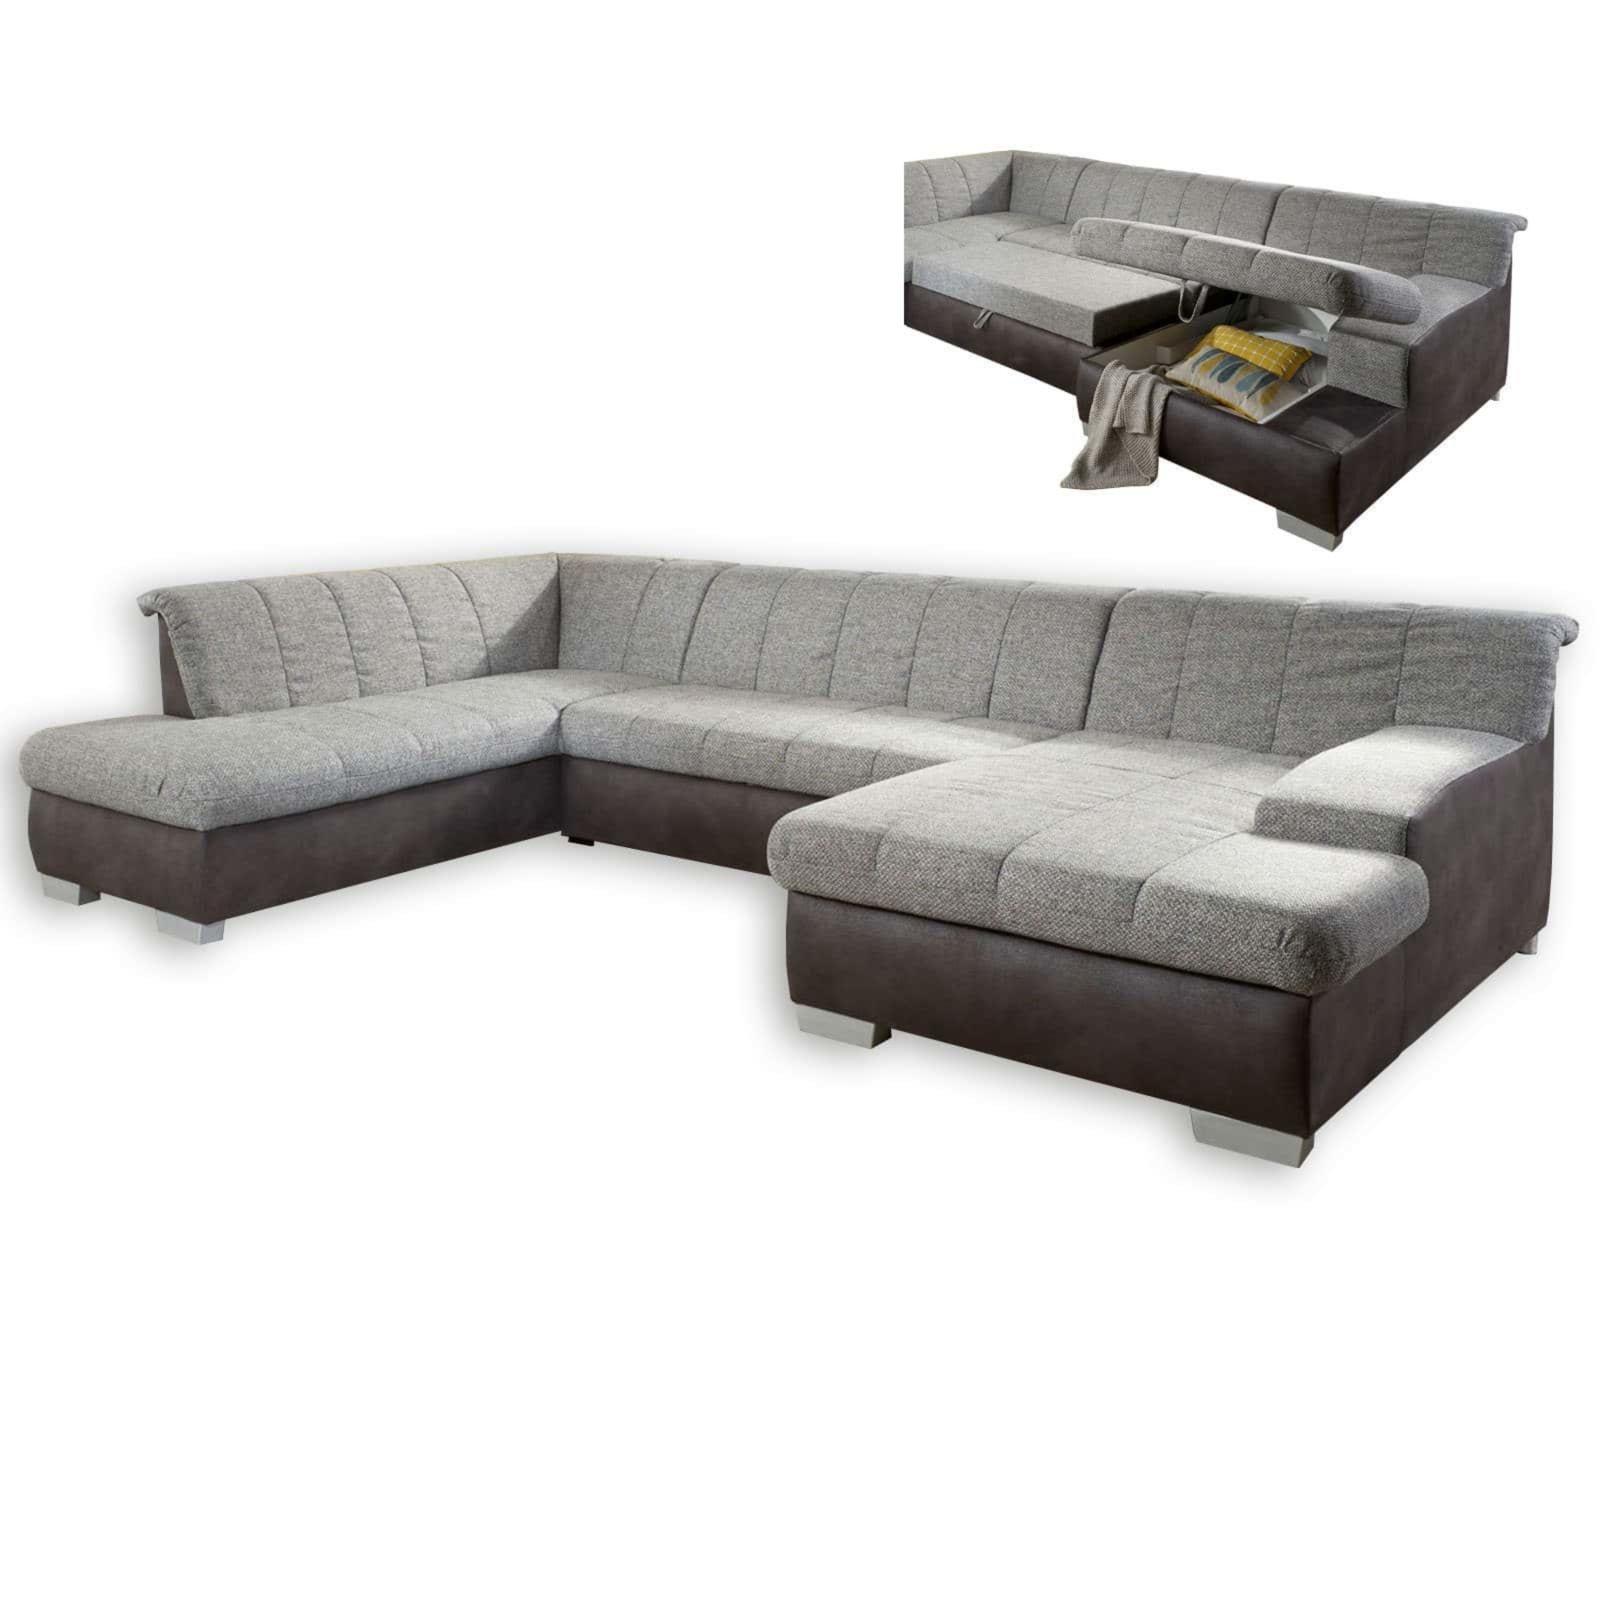 wohnlandschaft grau anthrazit mit funktionen. Black Bedroom Furniture Sets. Home Design Ideas